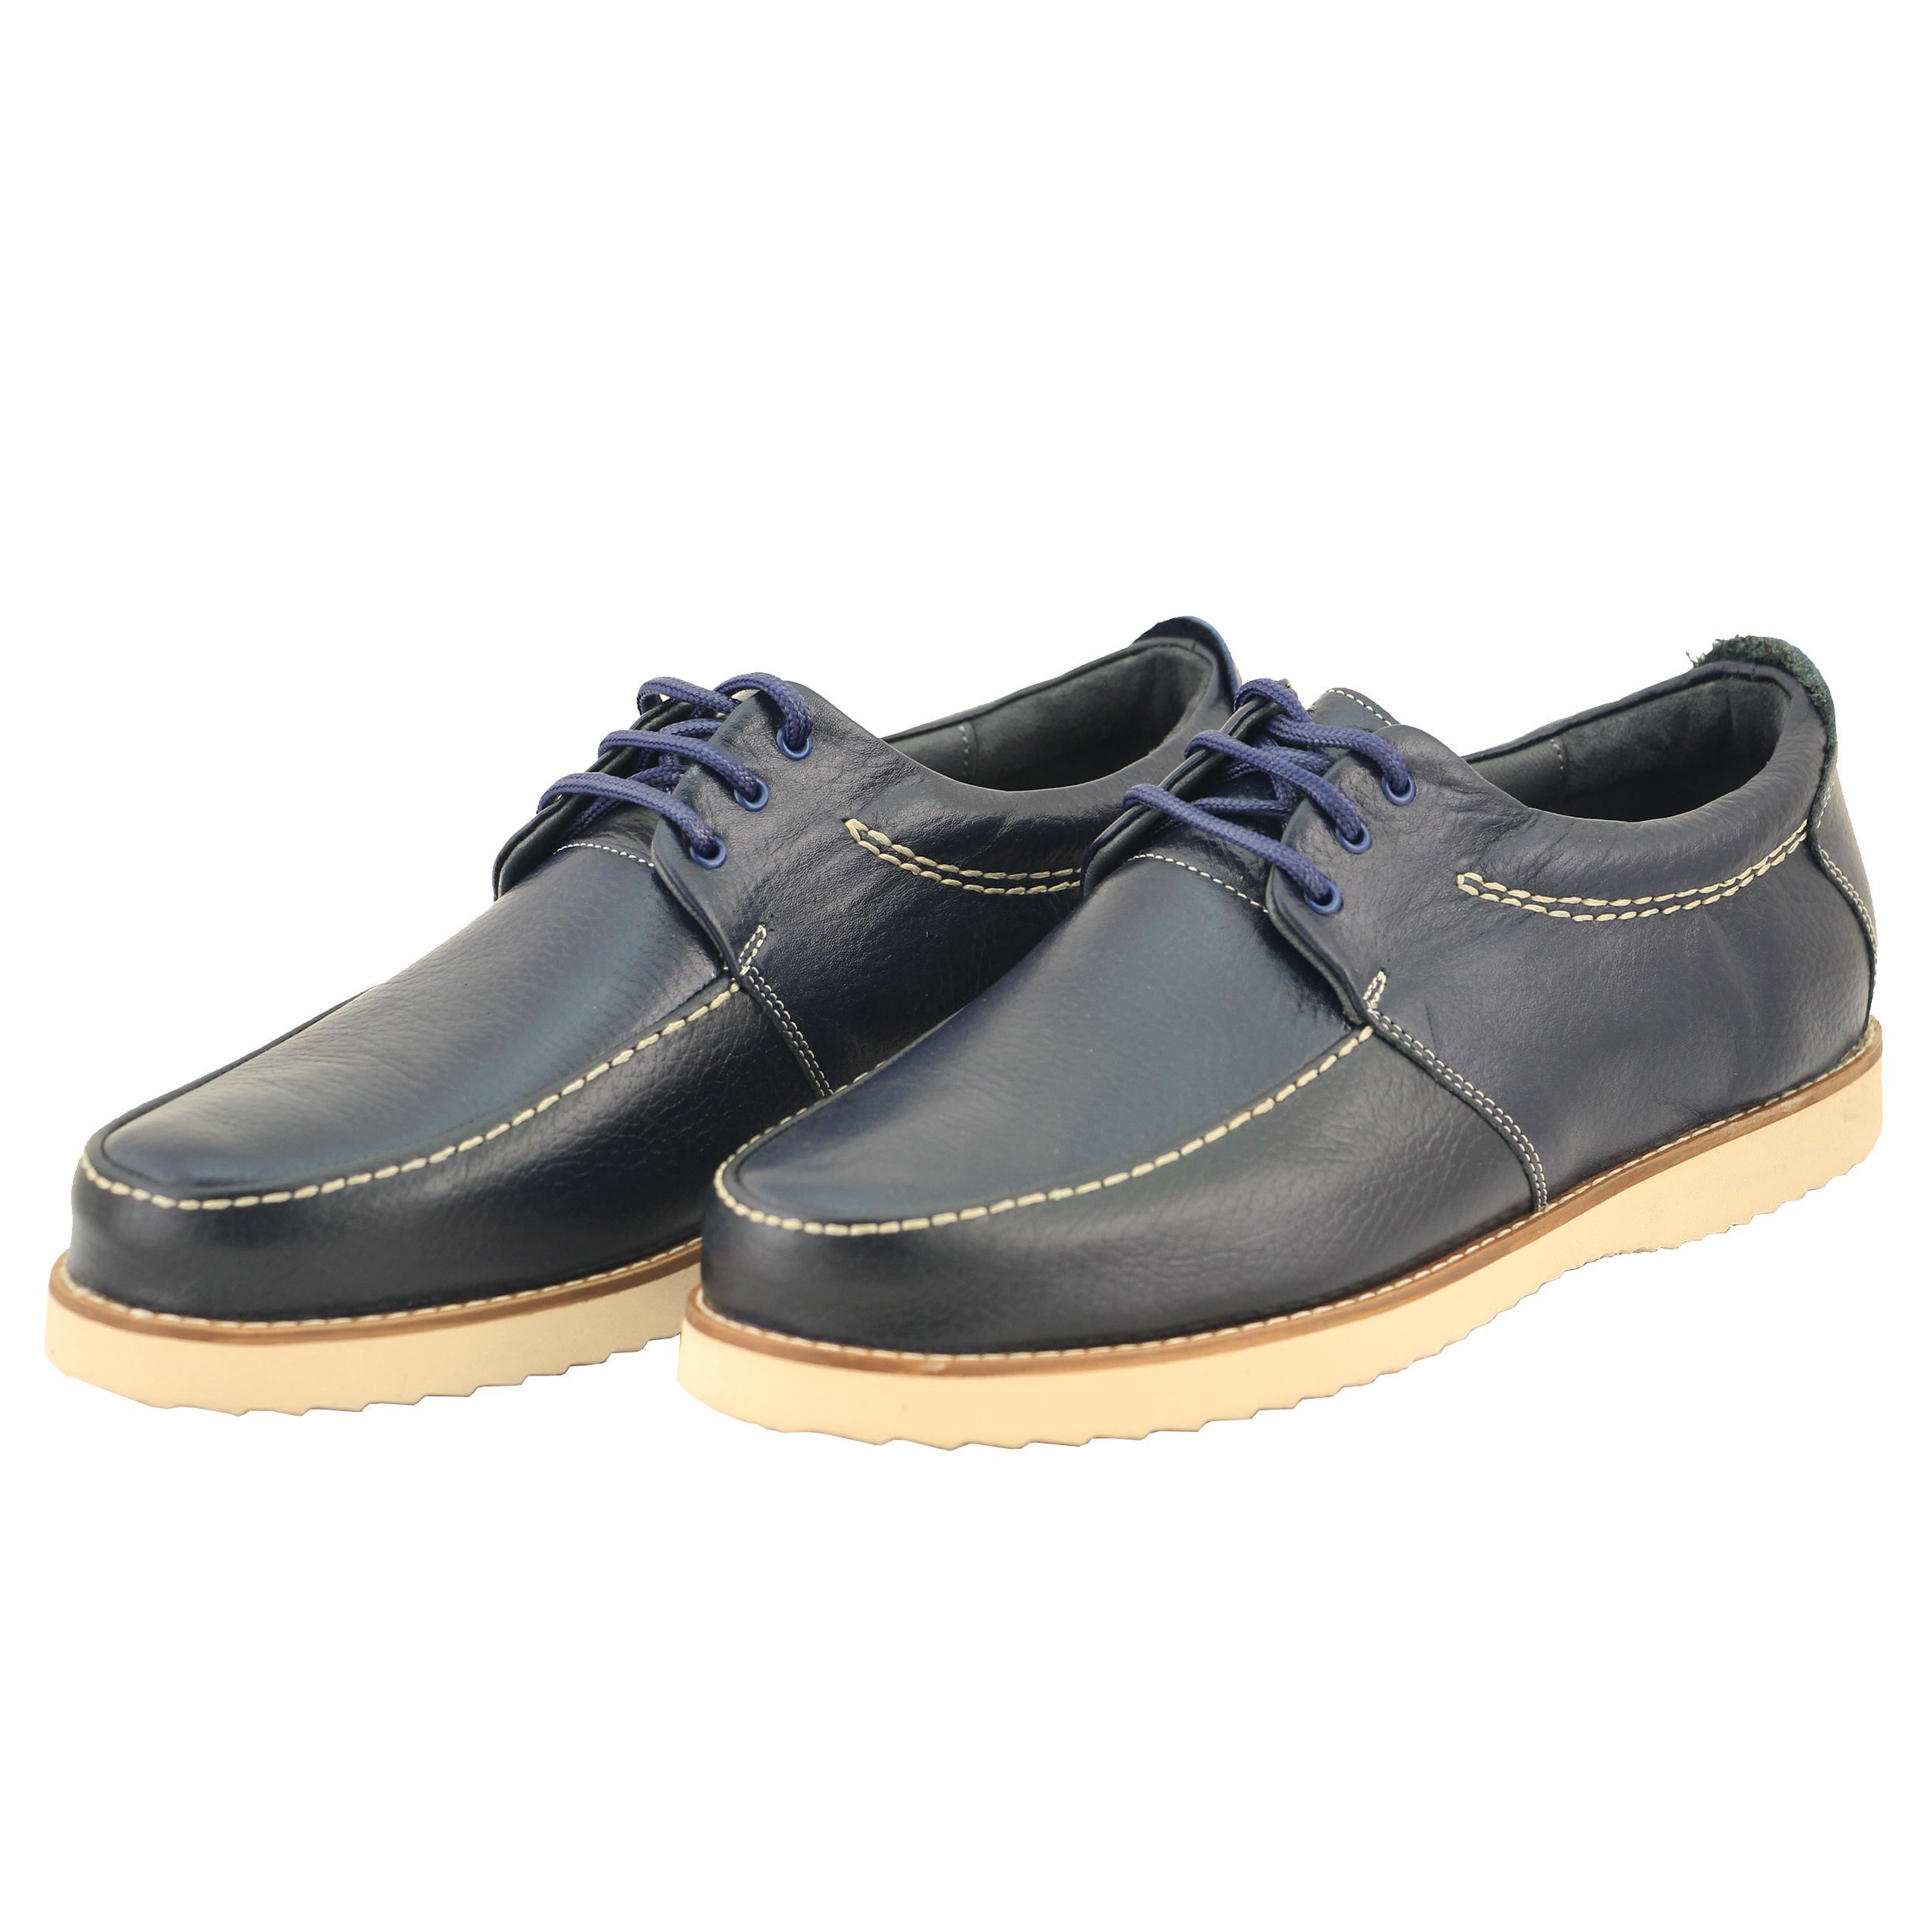 ADINCHARM leather men's casual shoes, DK101.sr Model